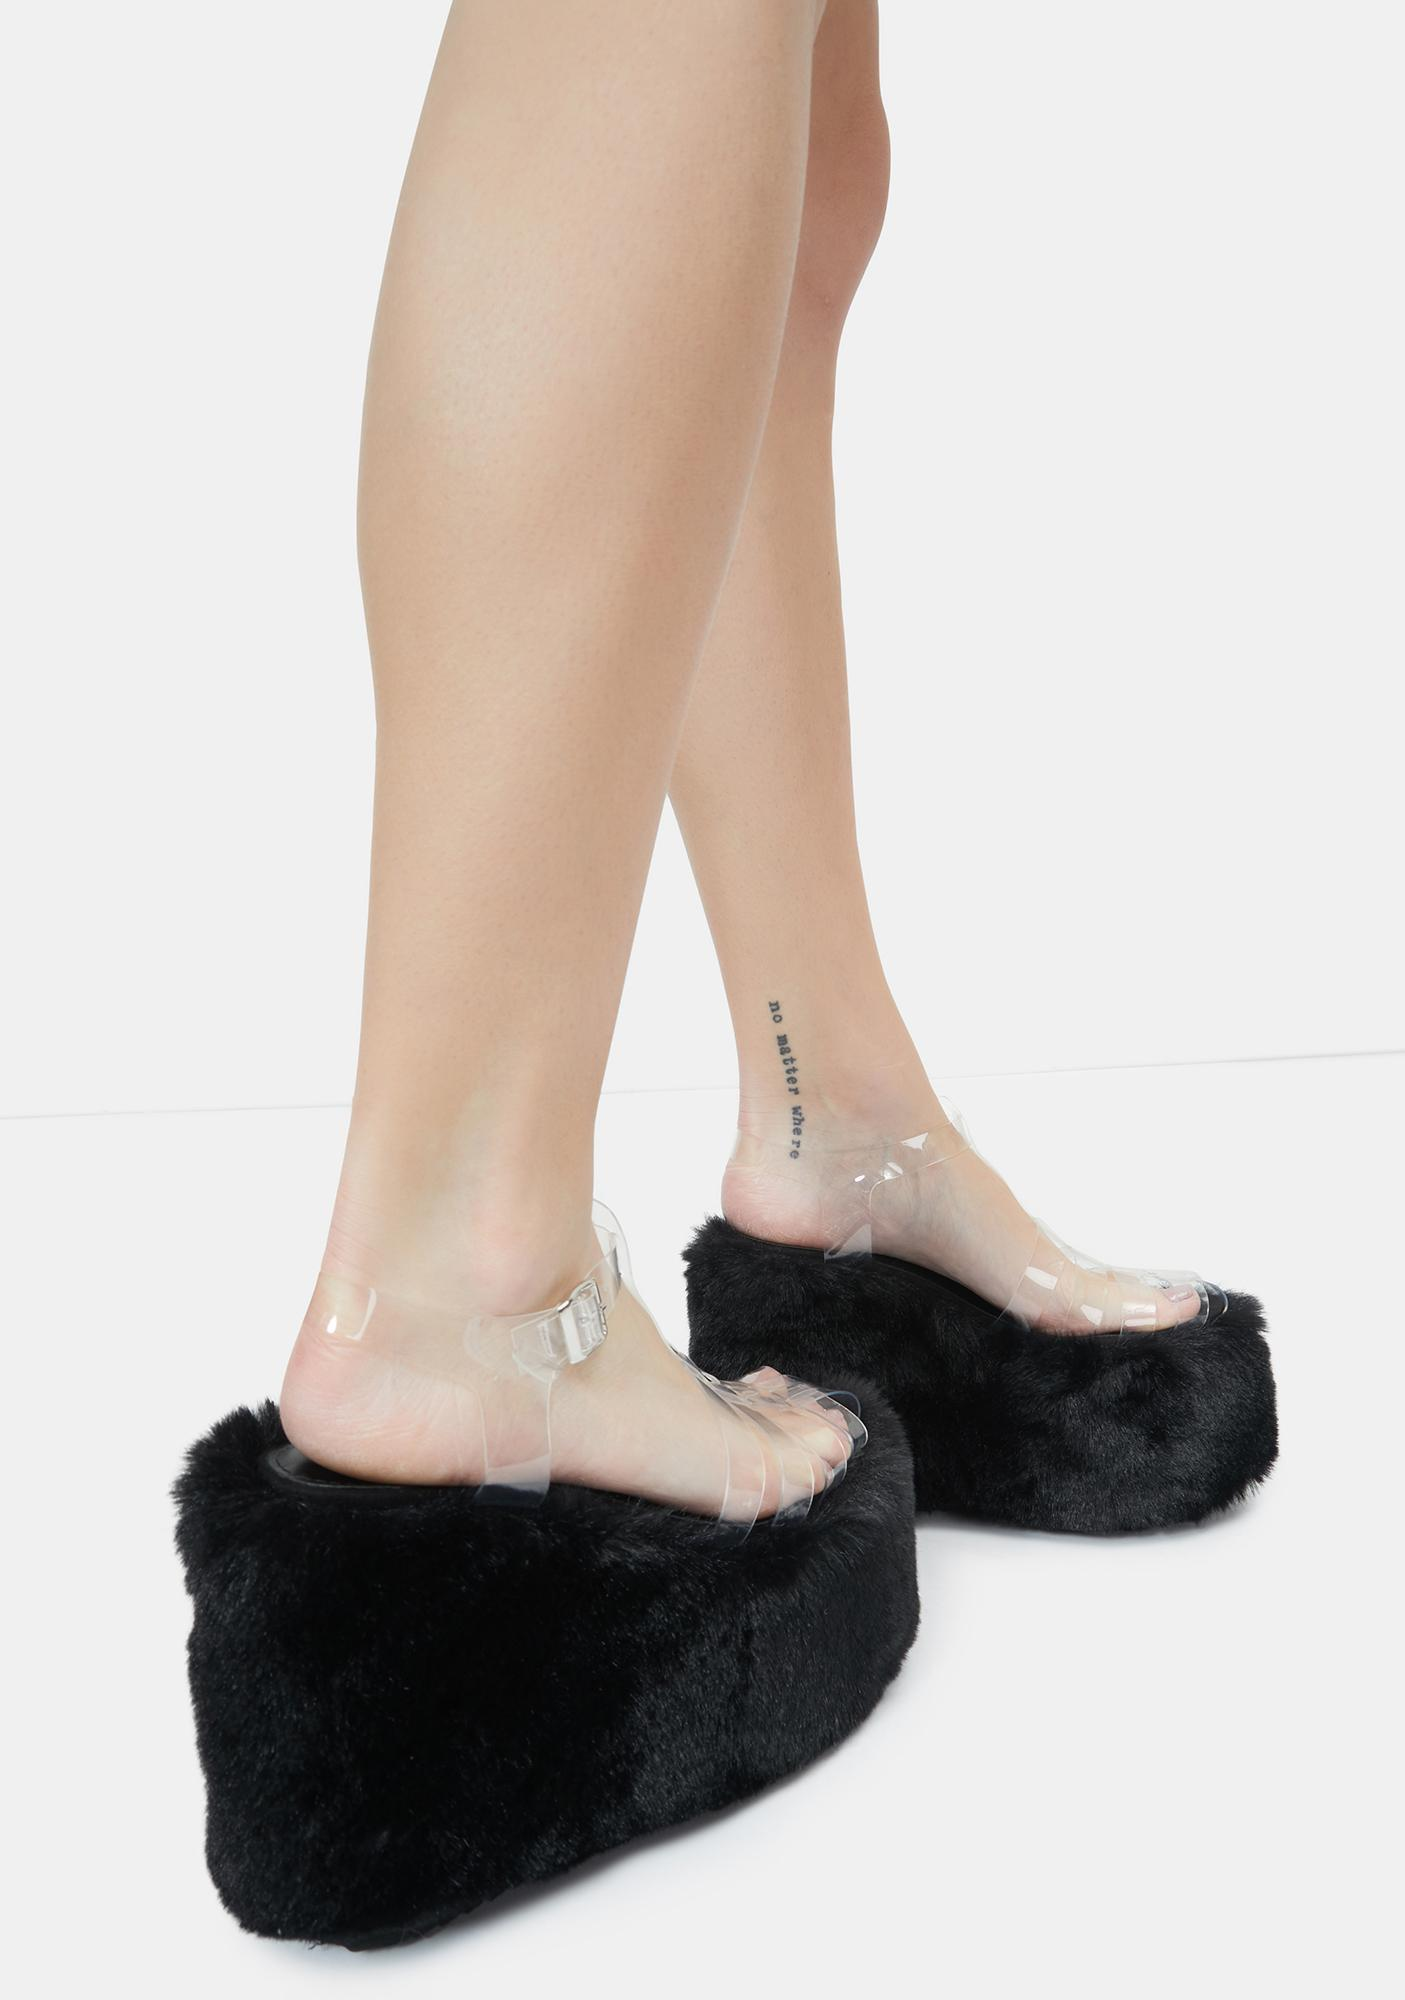 Lemon Drop by Privileged Black Zahara Platform Sandals